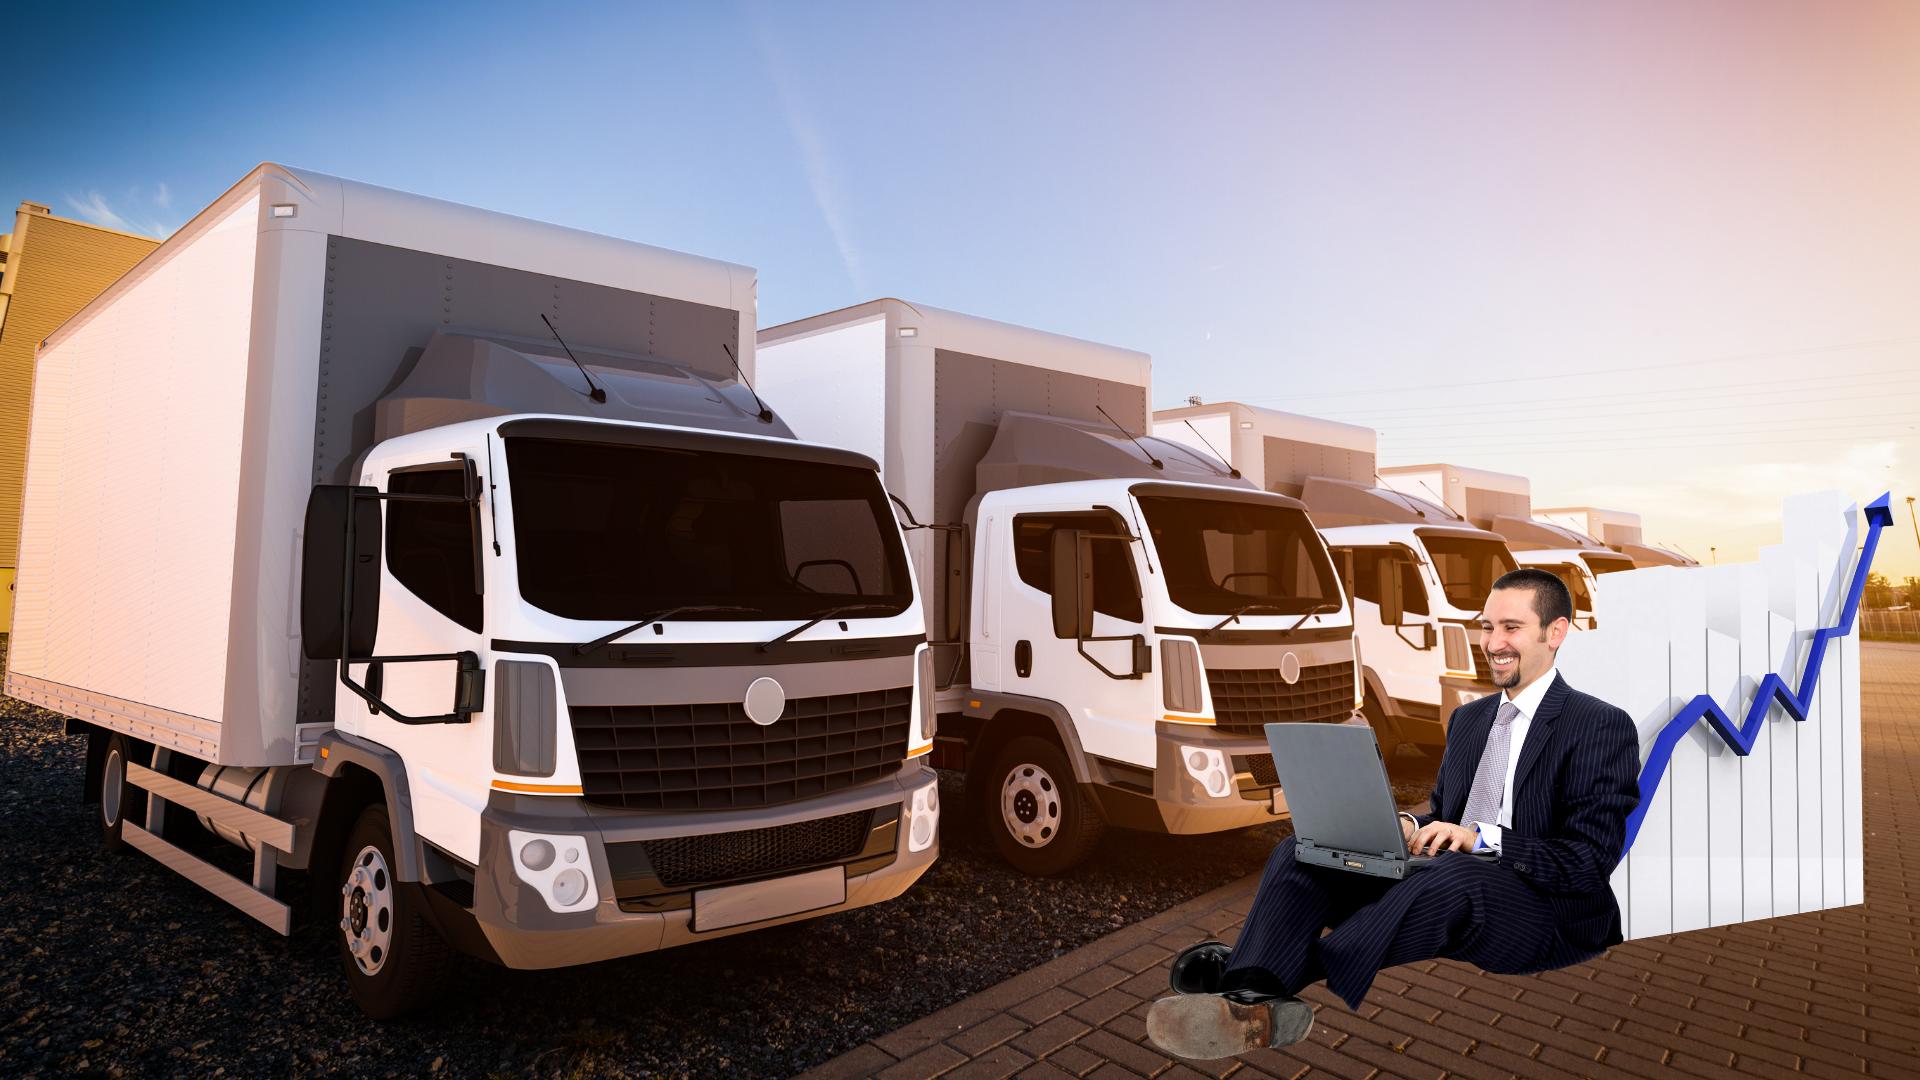 B'Smart: Innovative IoT systems add ML for smart fleet management